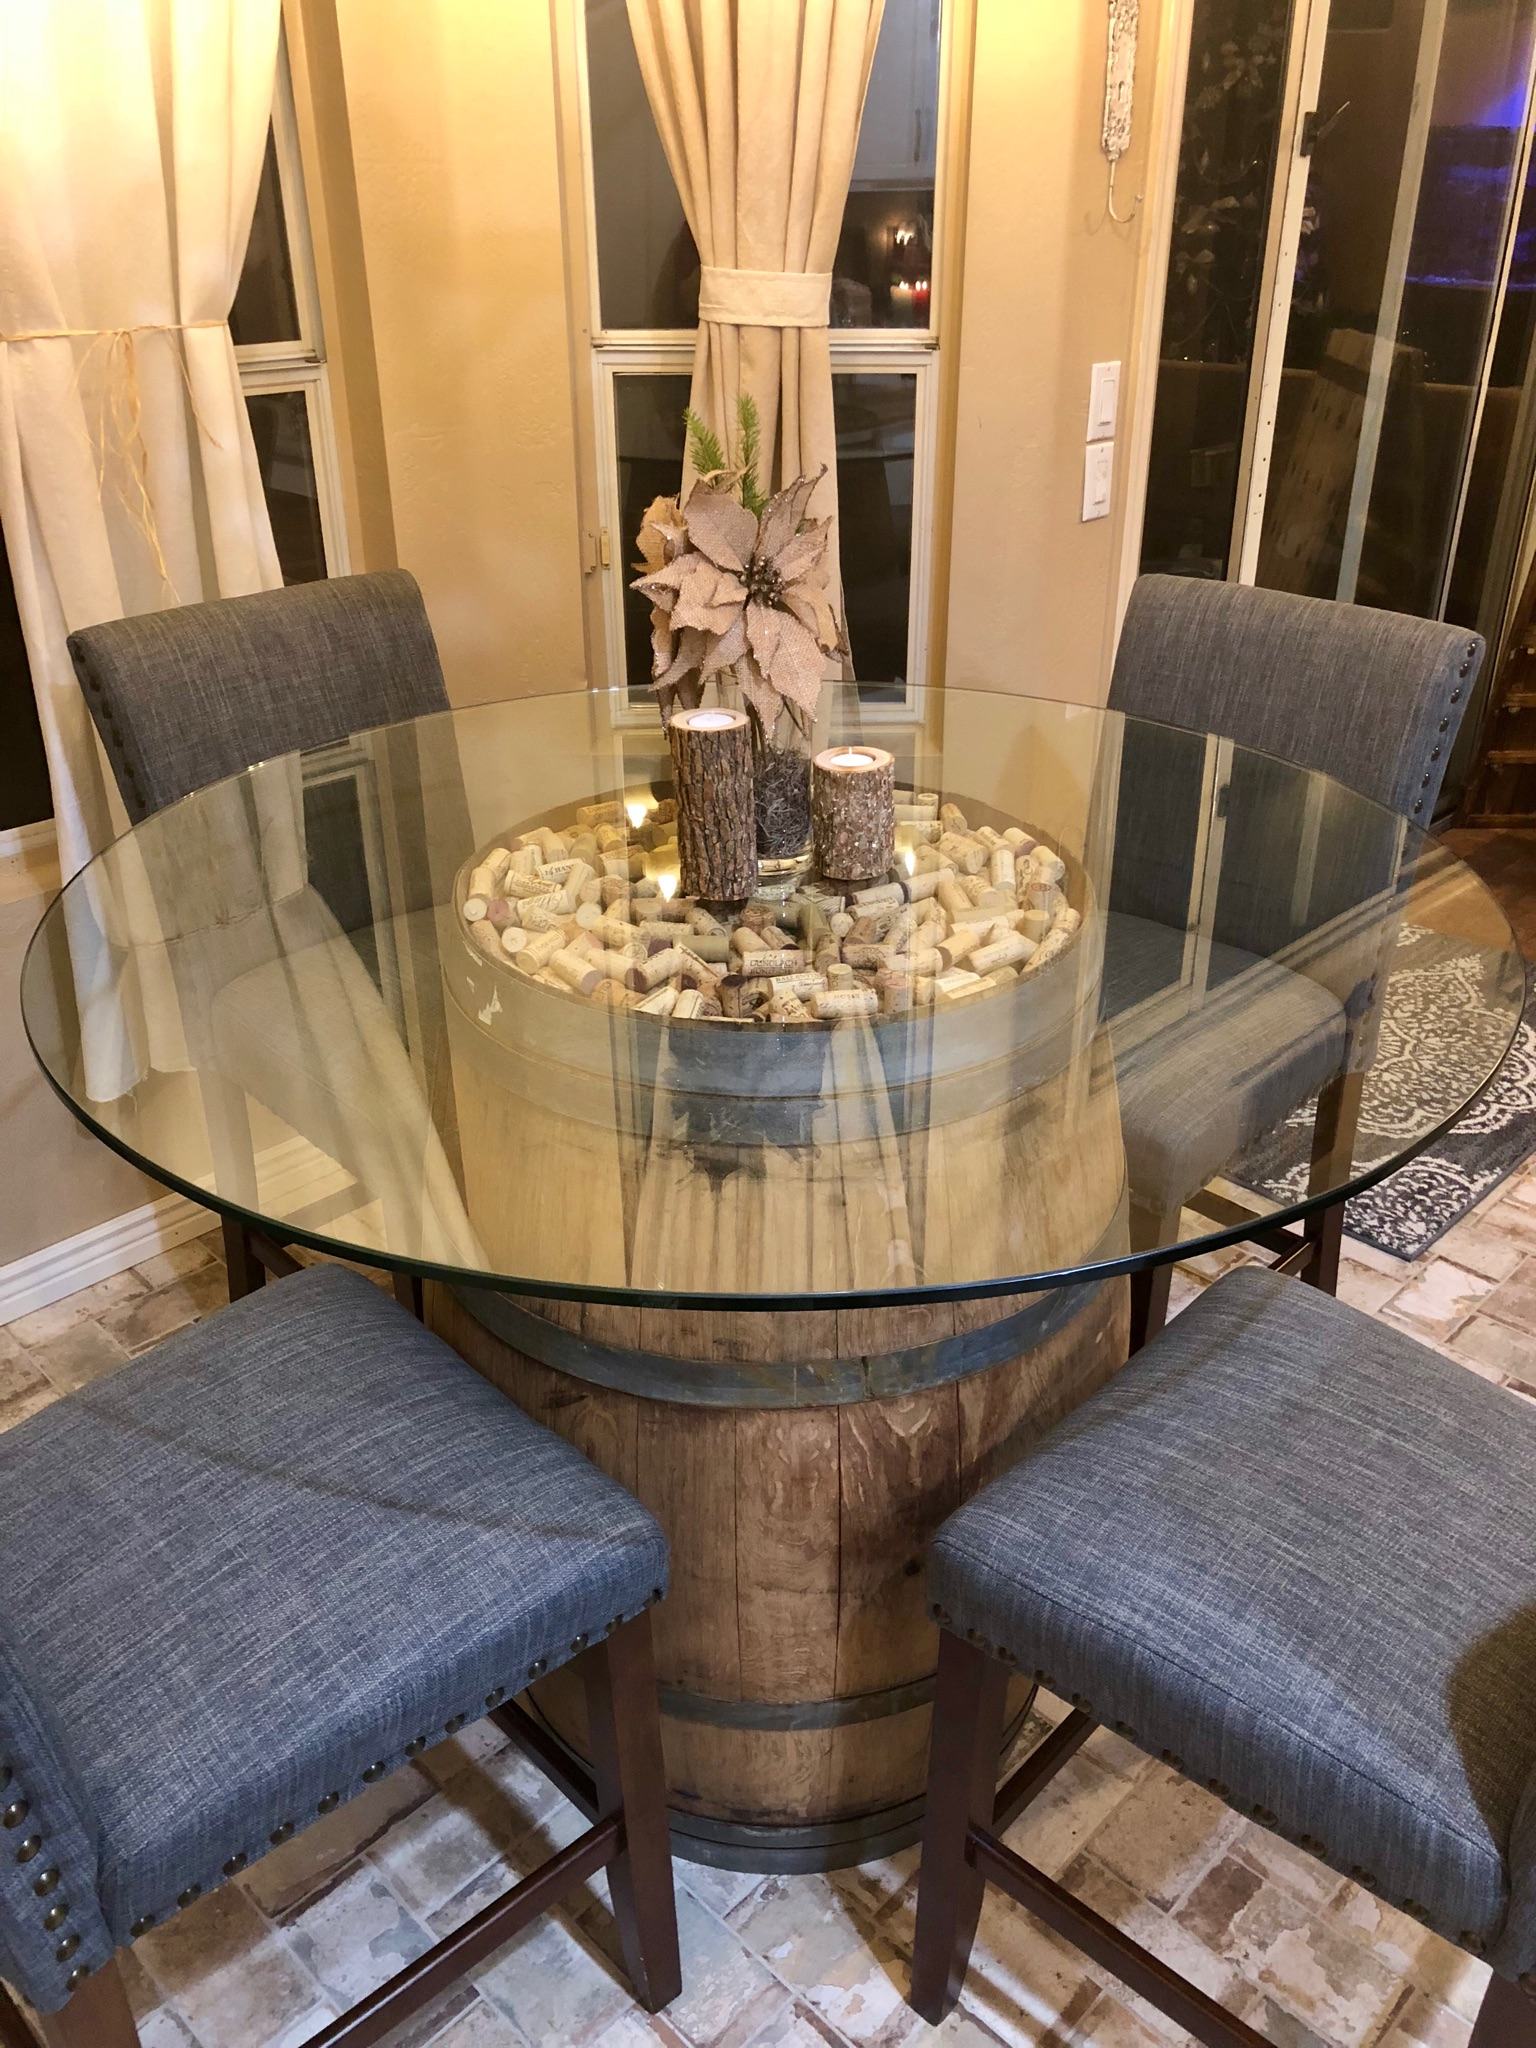 https://replacementwindowsscottsdale.net/wp-content/uploads/2018/01/Custom-Glass-Table-Tops-Scottsdale.jpg